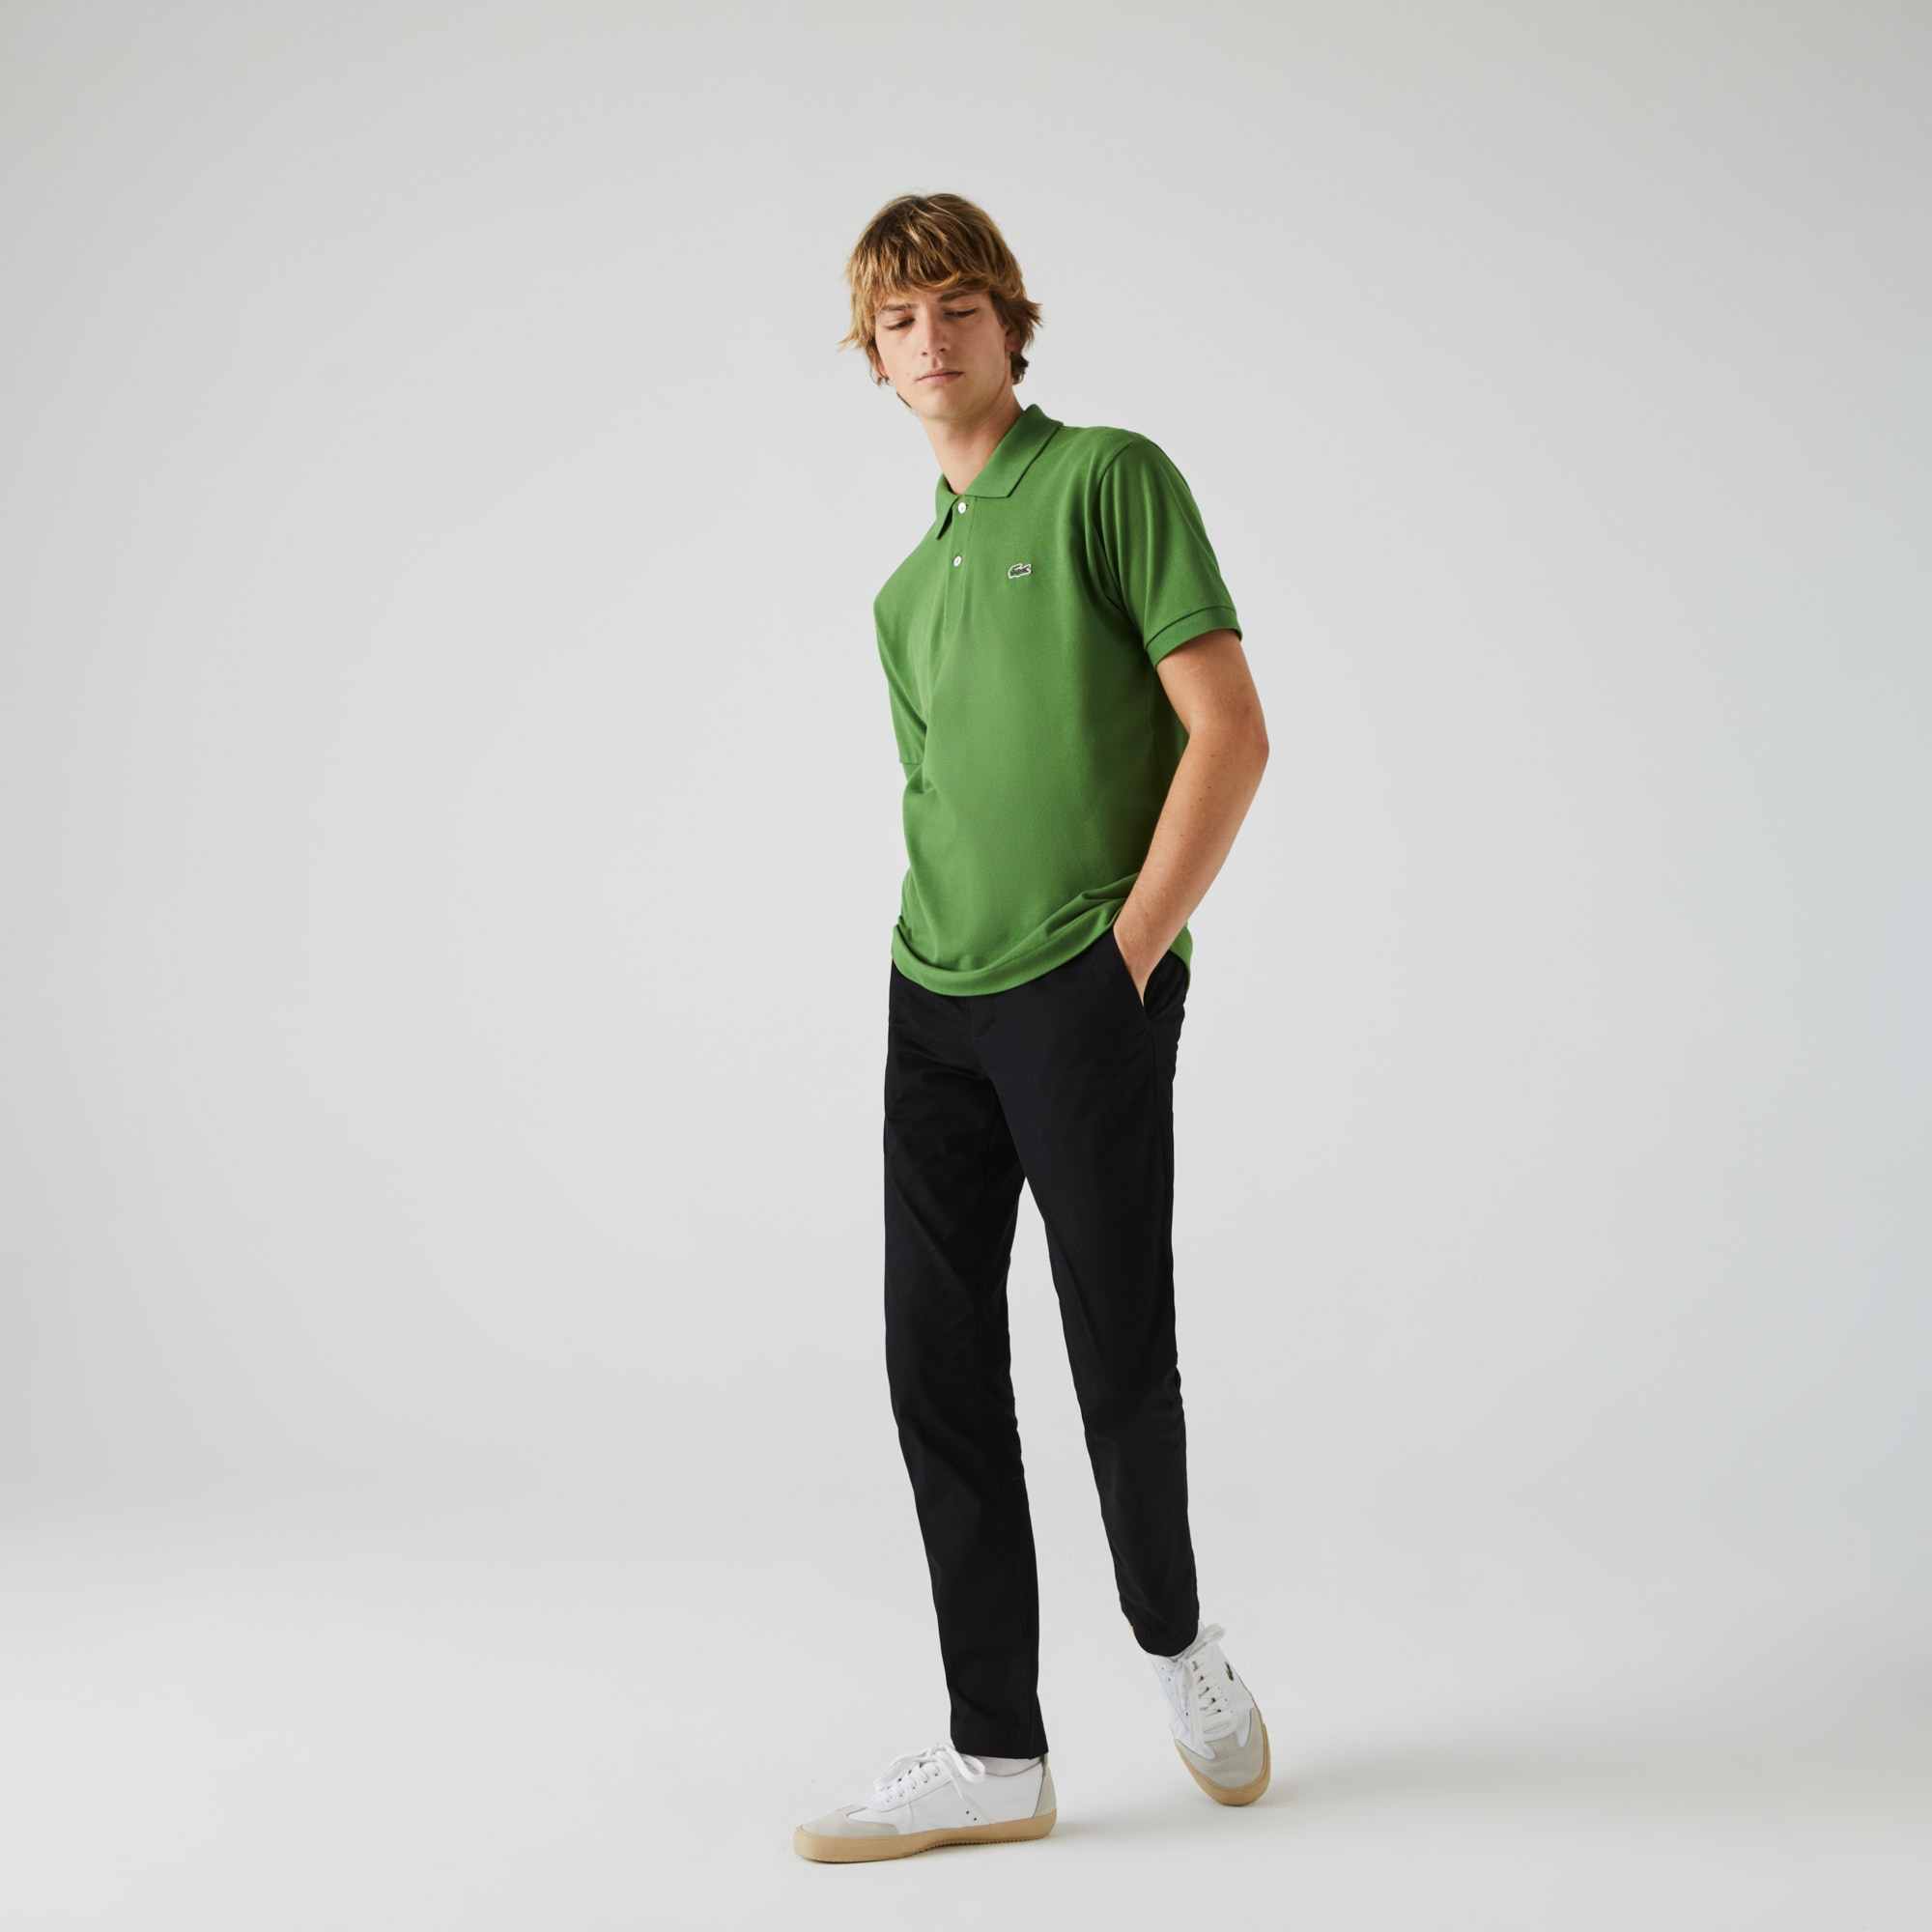 Men 39 S Polo Shirts Lacoste Polo Shirts For Men Lacoste